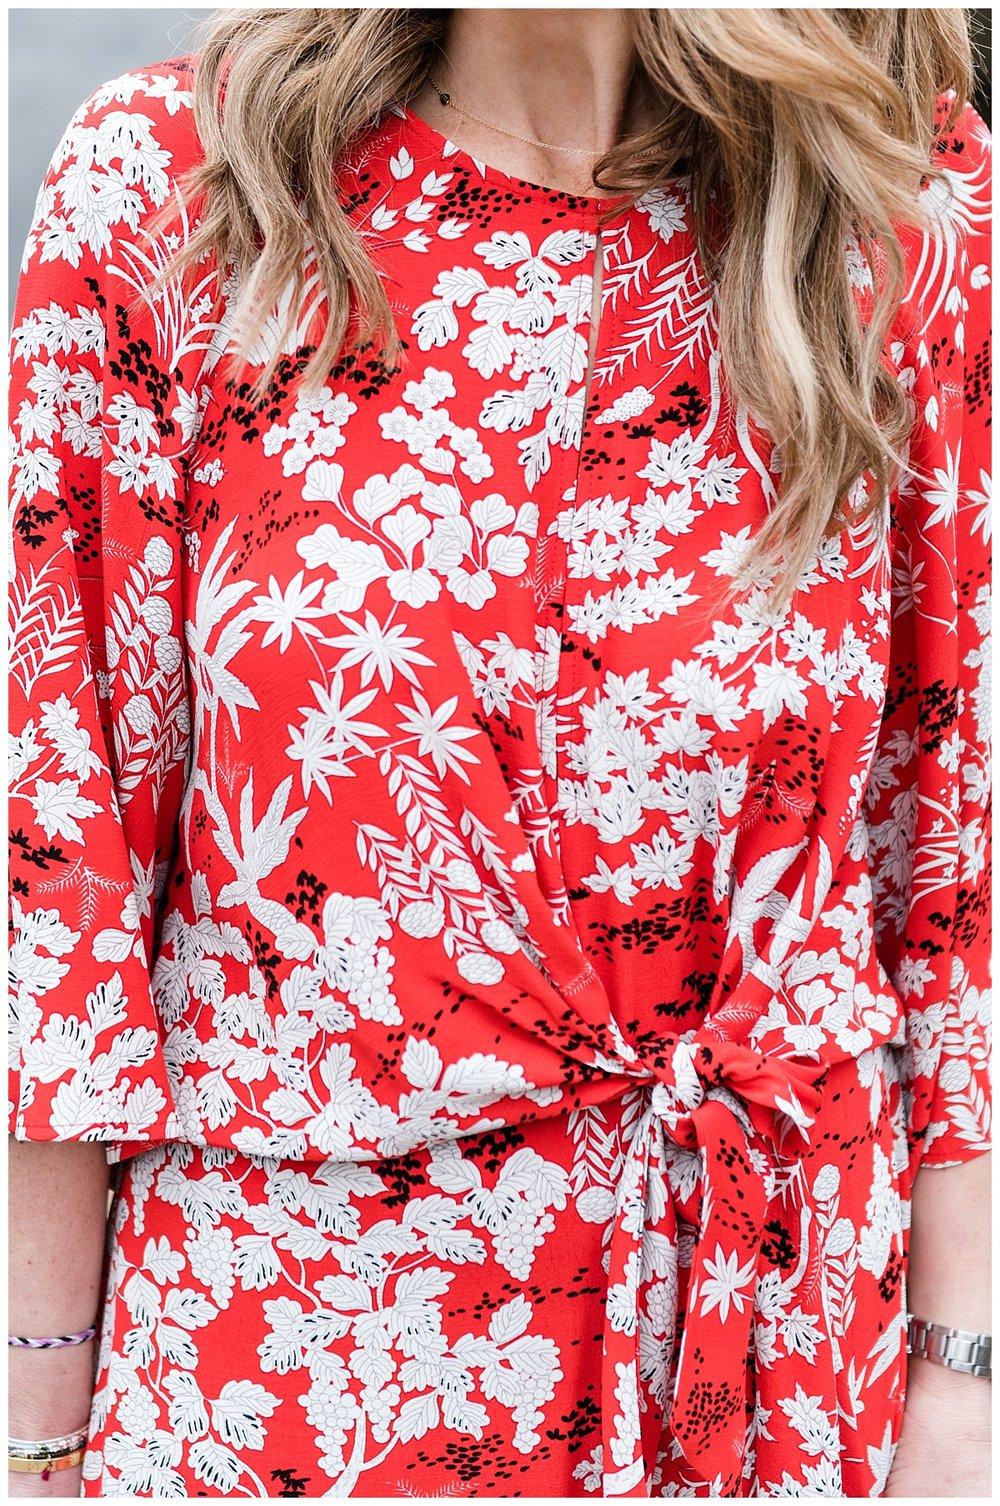 Red floral dress_1108.jpg